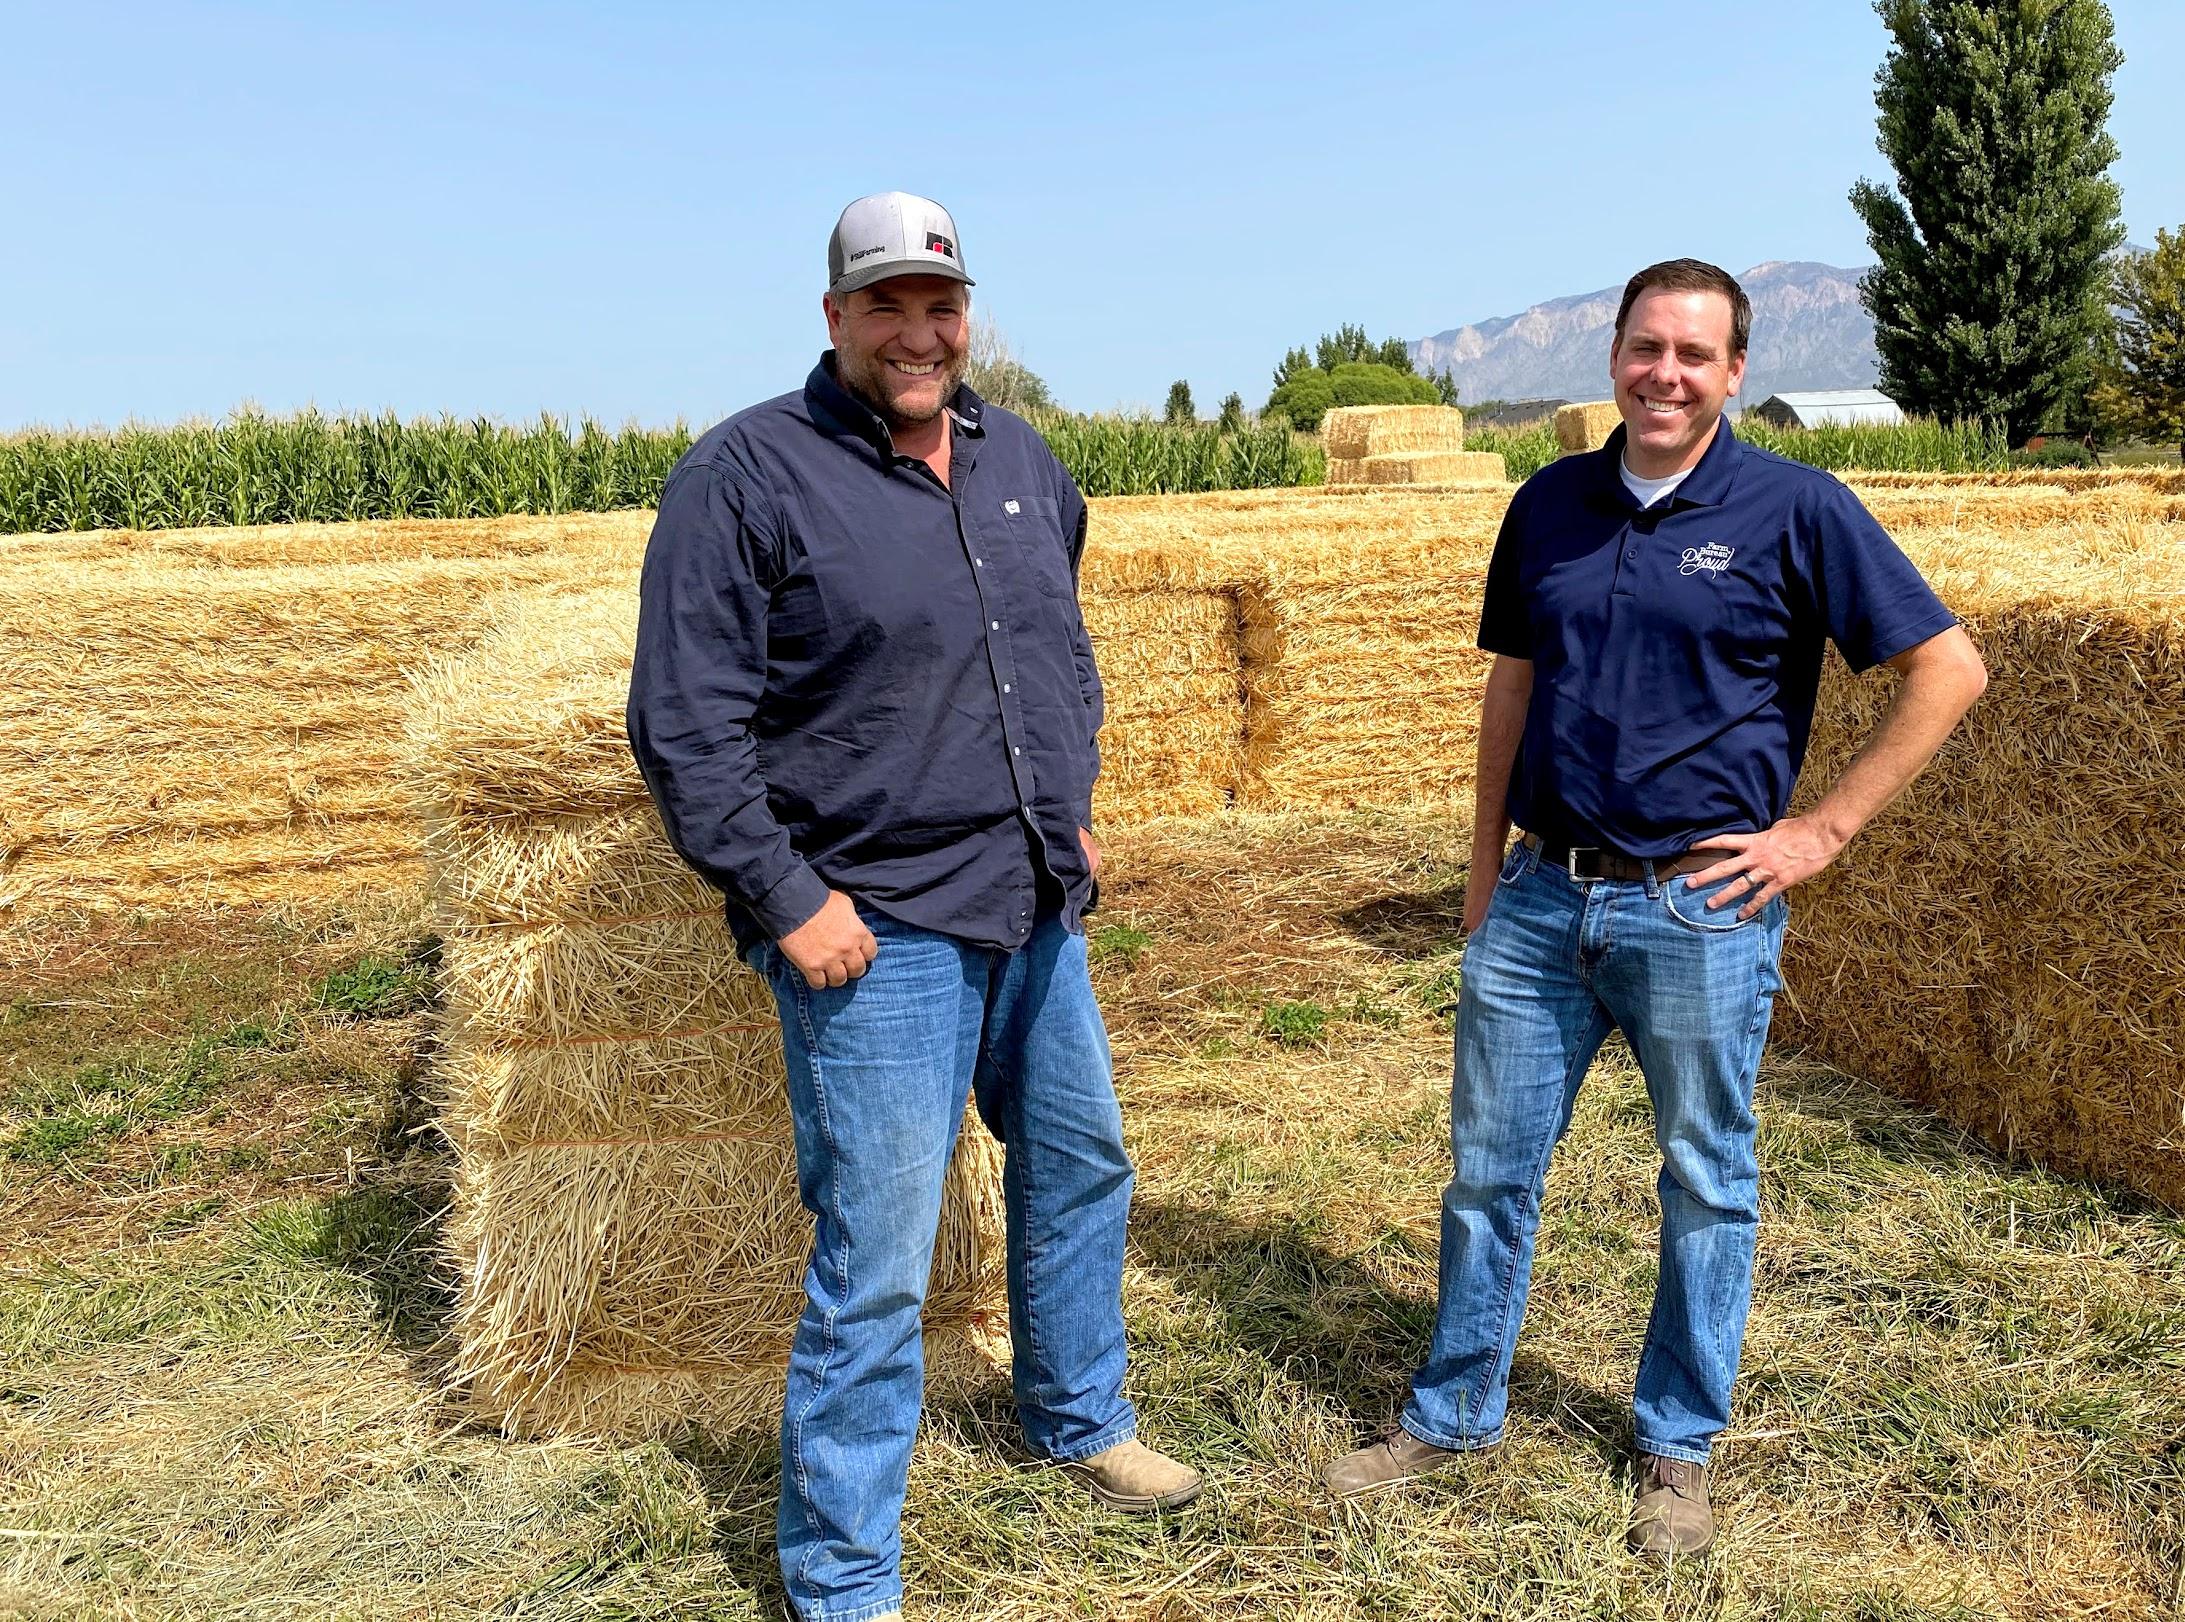 Utah Farm Bureau President Ron Gibson, left, and Matt Hargreaves, the bureau's vice president in charge of communications.